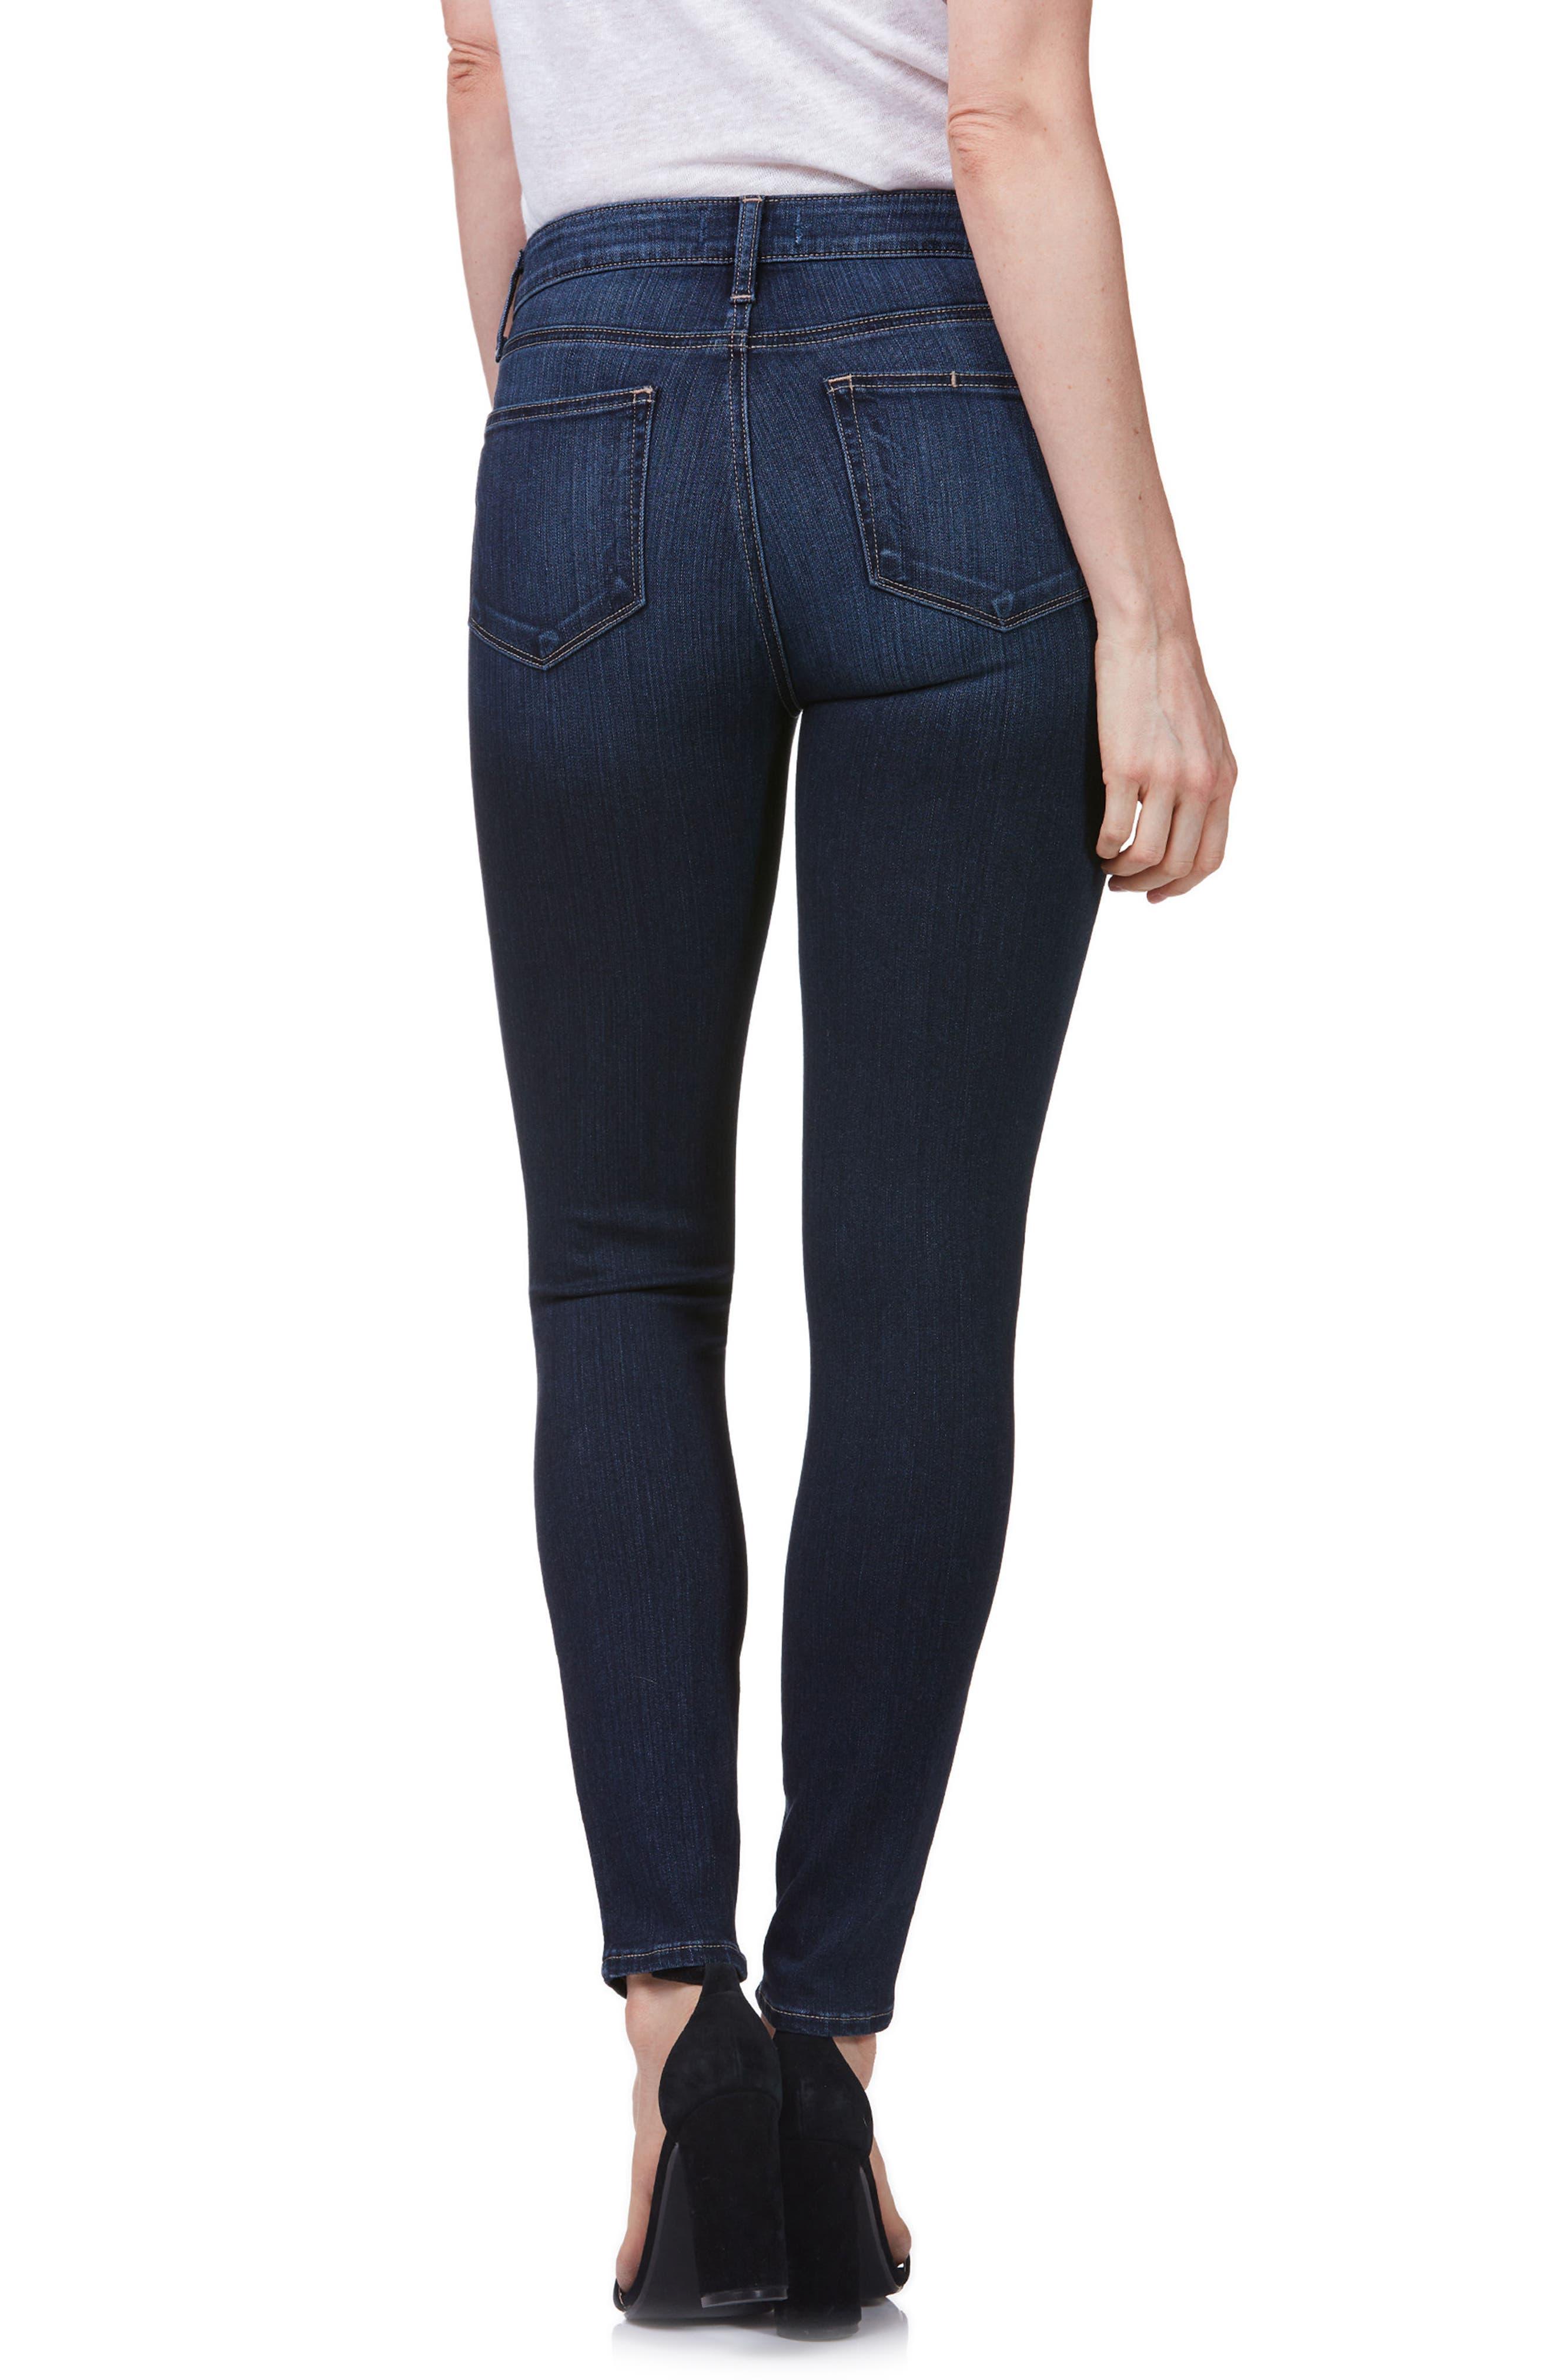 Hoxton High Waist Ultra Skinny Jeans,                             Alternate thumbnail 2, color,                             400